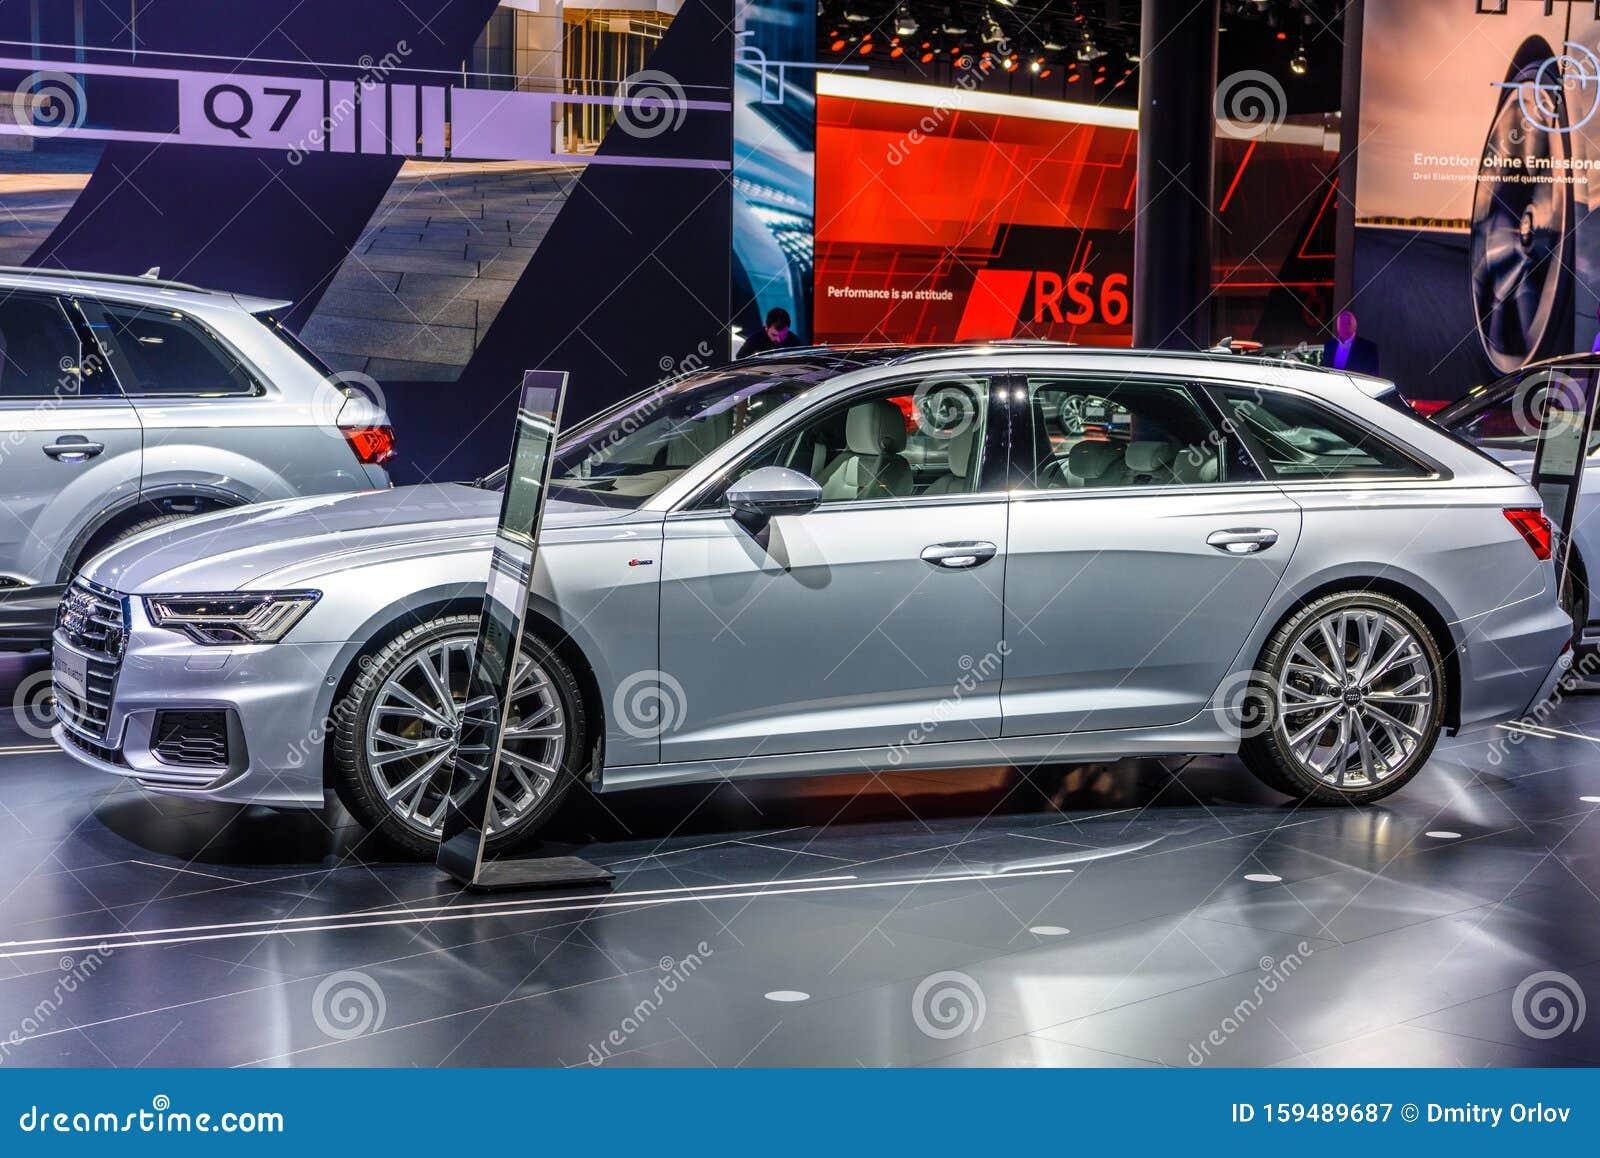 Kekurangan Audi Combi Perbandingan Harga